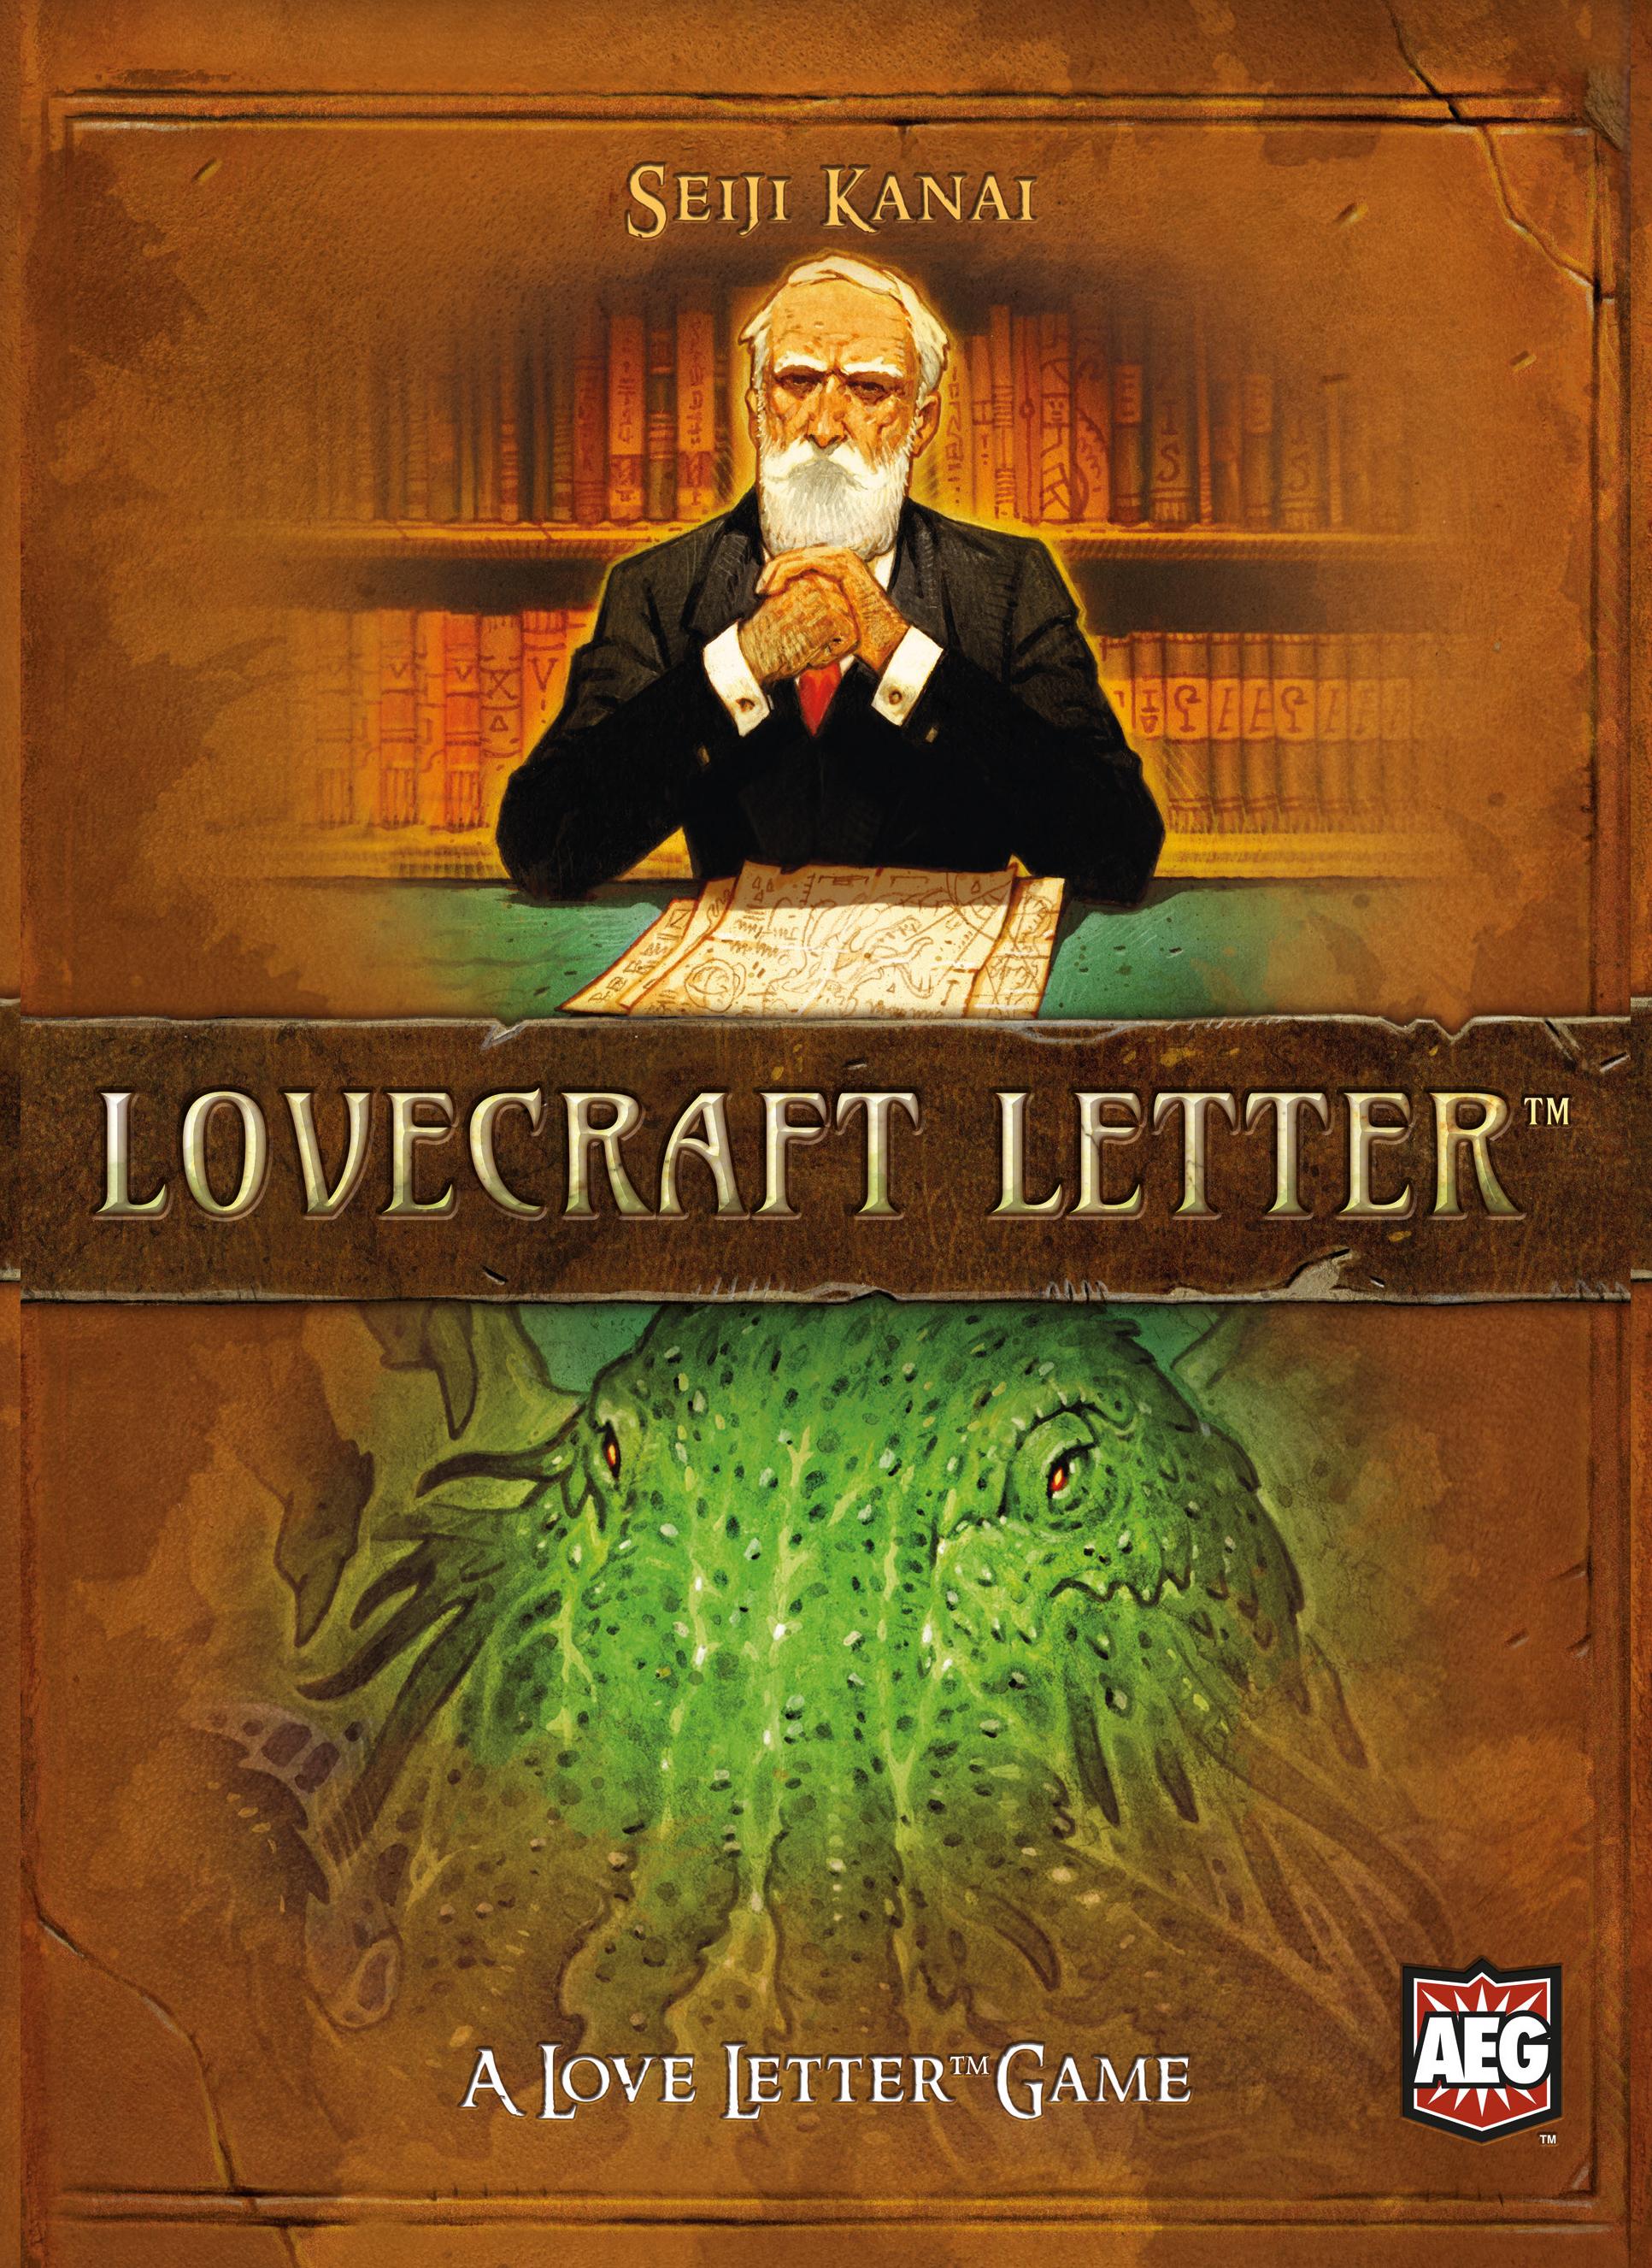 Lovecraft Letter